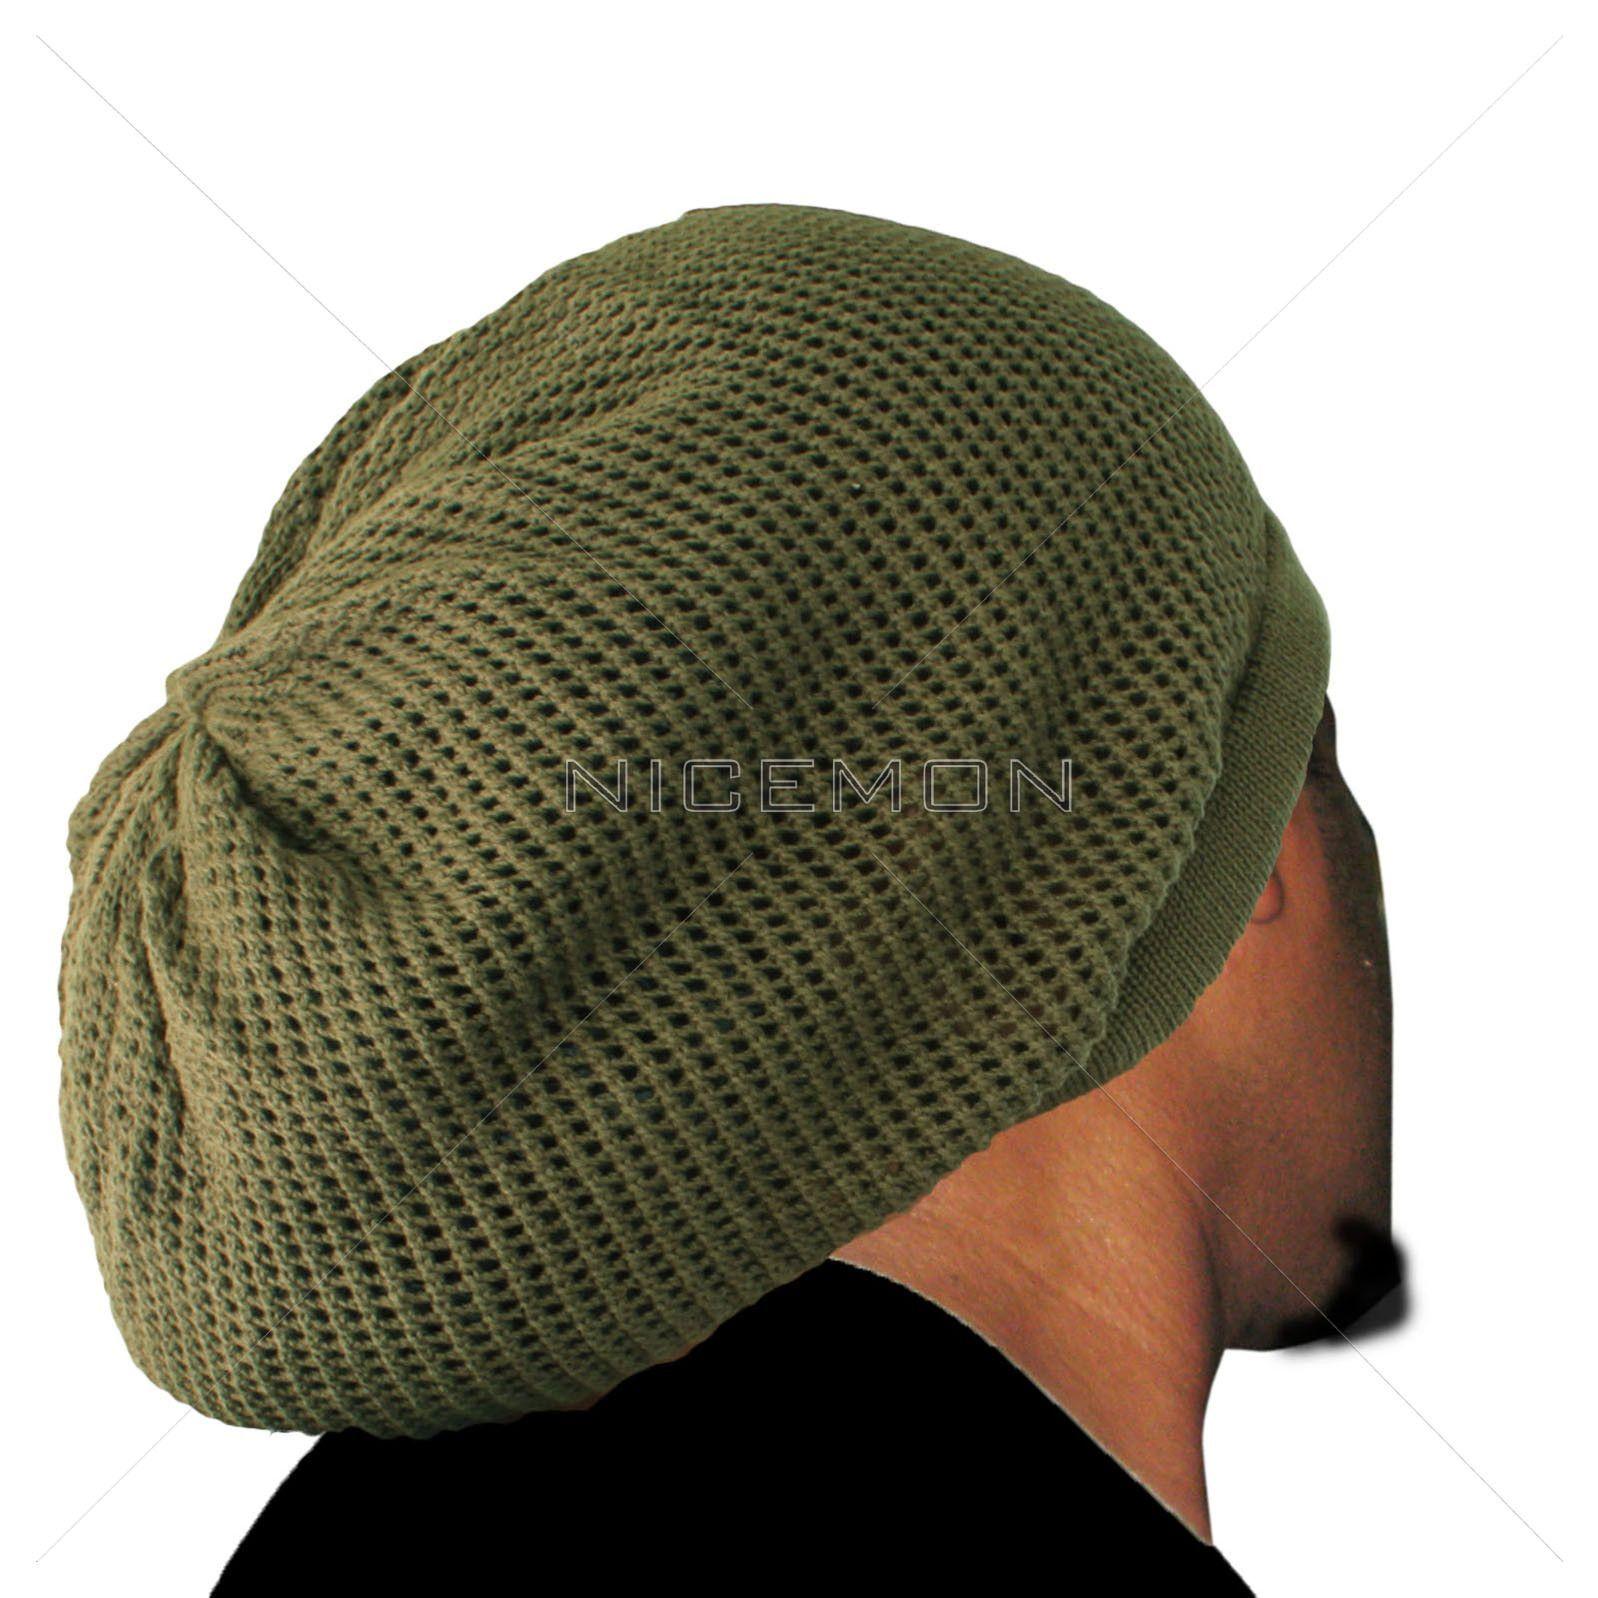 82ab8688b 100% Cotton Mesh Nattydread Rasta Cap Hat Tam Bonet Roots Reggae ...